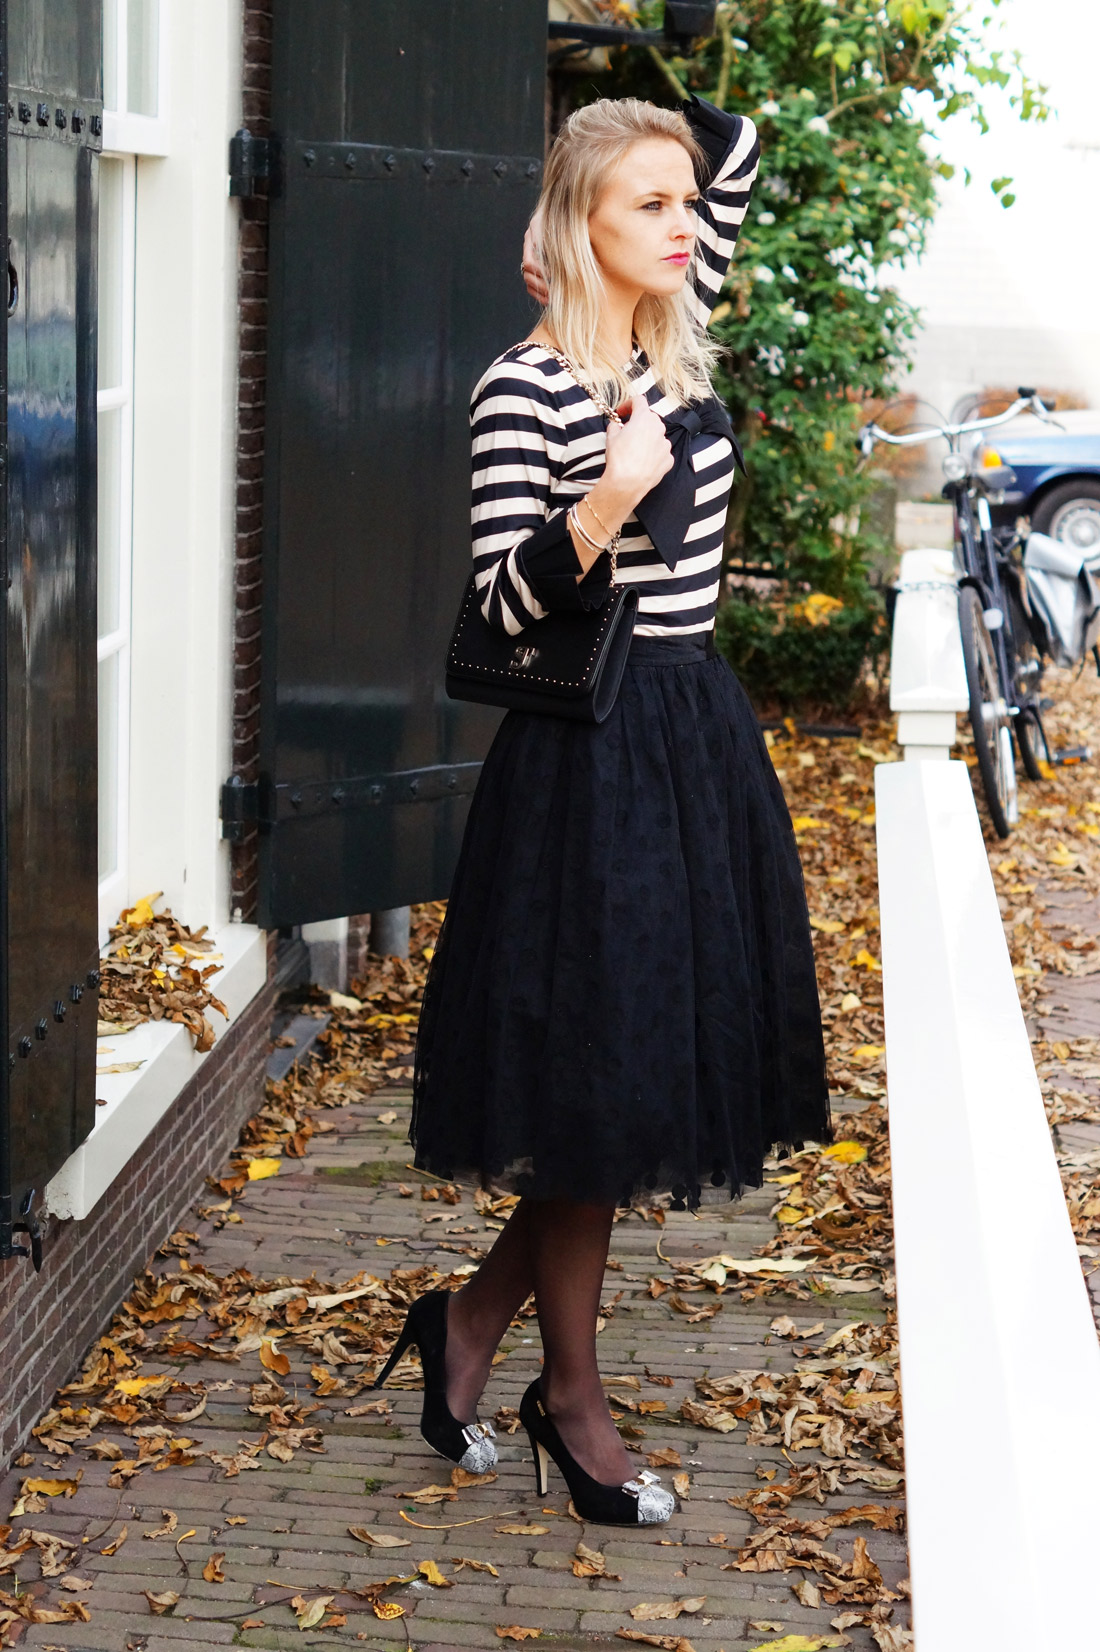 Bag-at-you---Fashion-blog---Dainty-Jewell'---Polka-Dot-Tutu-Skirt---Supertrash-envelop-bag--The-good-girl-Amsterdam